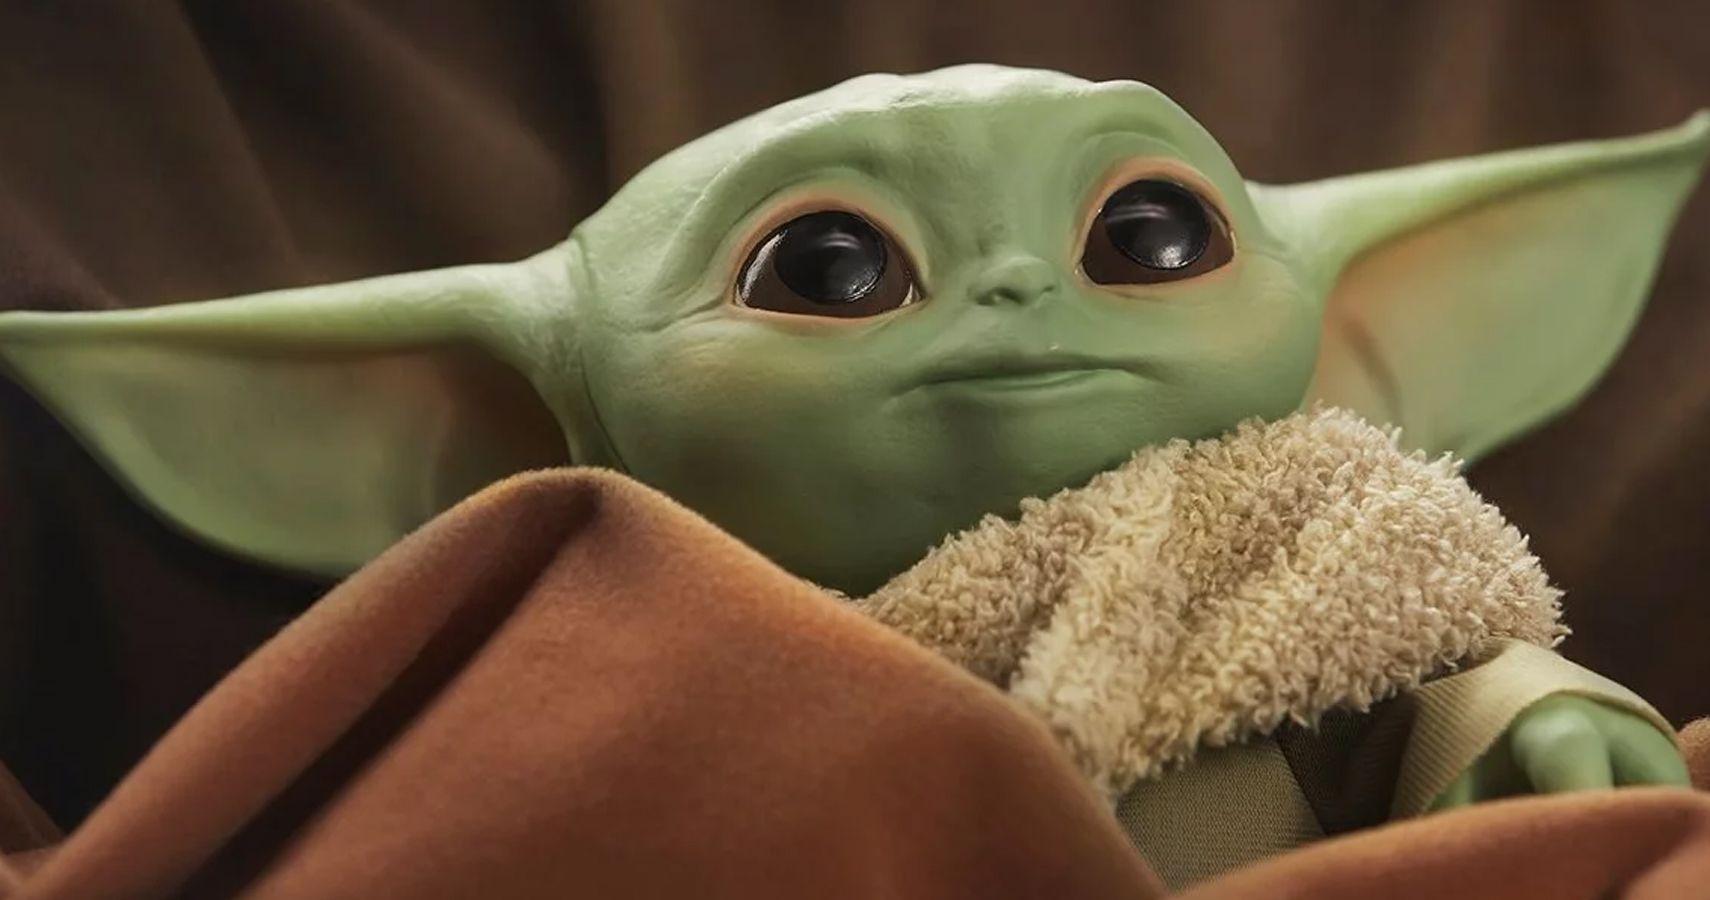 More Baby Yoda Merch Has Finally Been Revealed! | Screen Rant